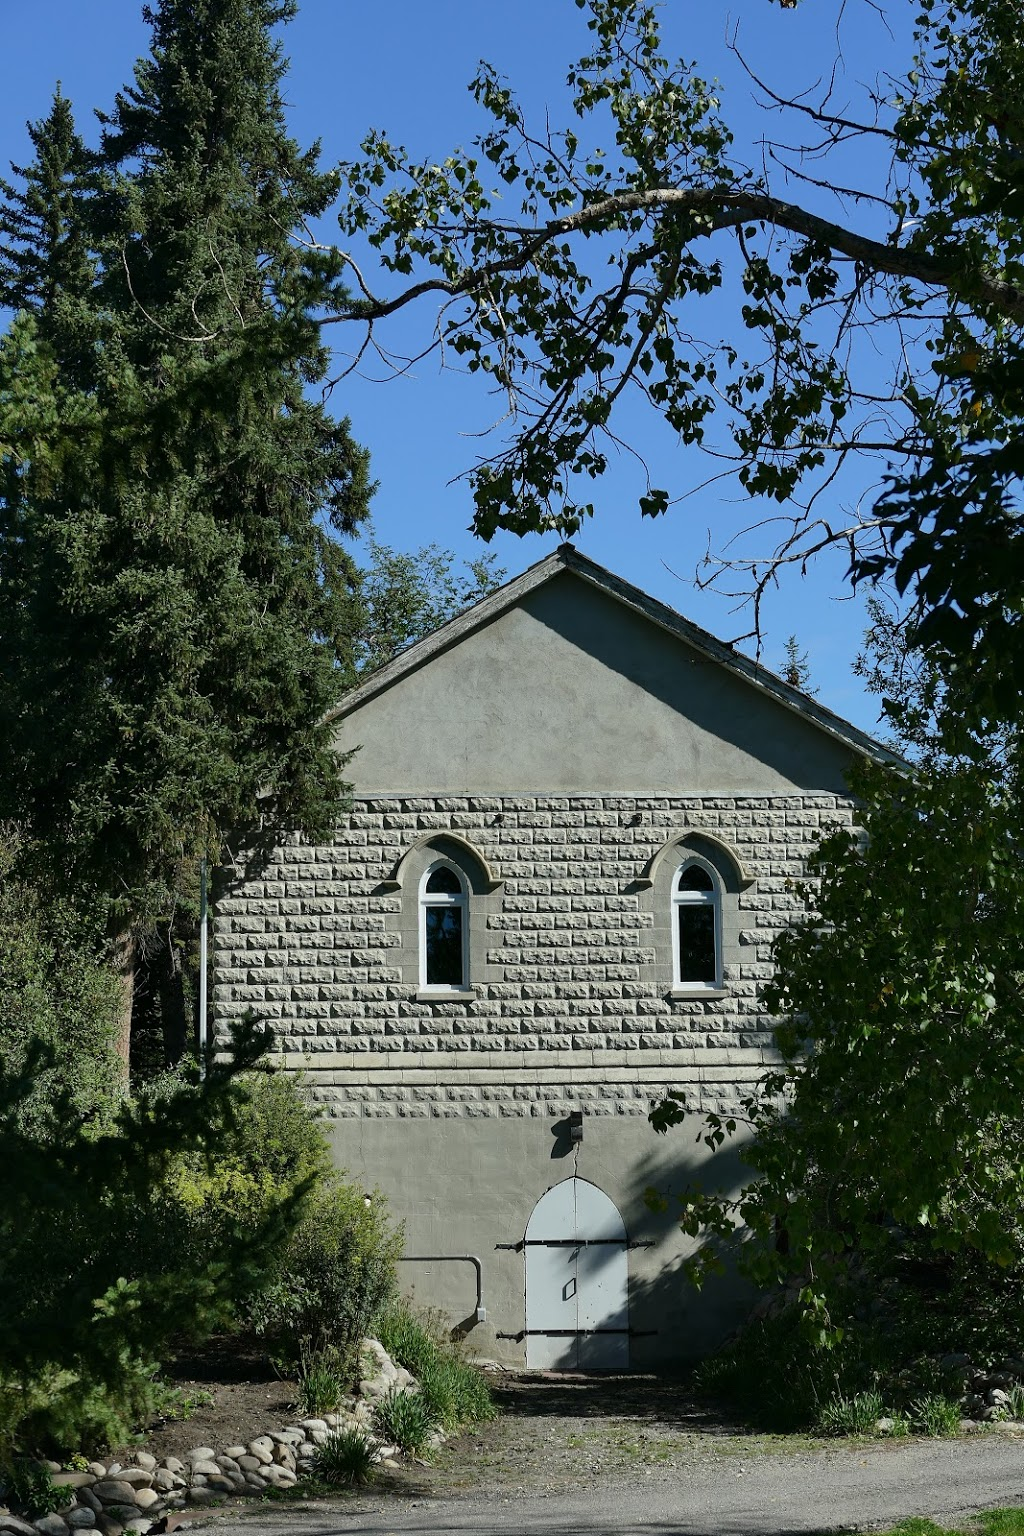 Union Cemetery | cemetery | Erlton St & 32 Ave SW, Calgary, AB T2G, Canada | 4032213660 OR +1 403-221-3660